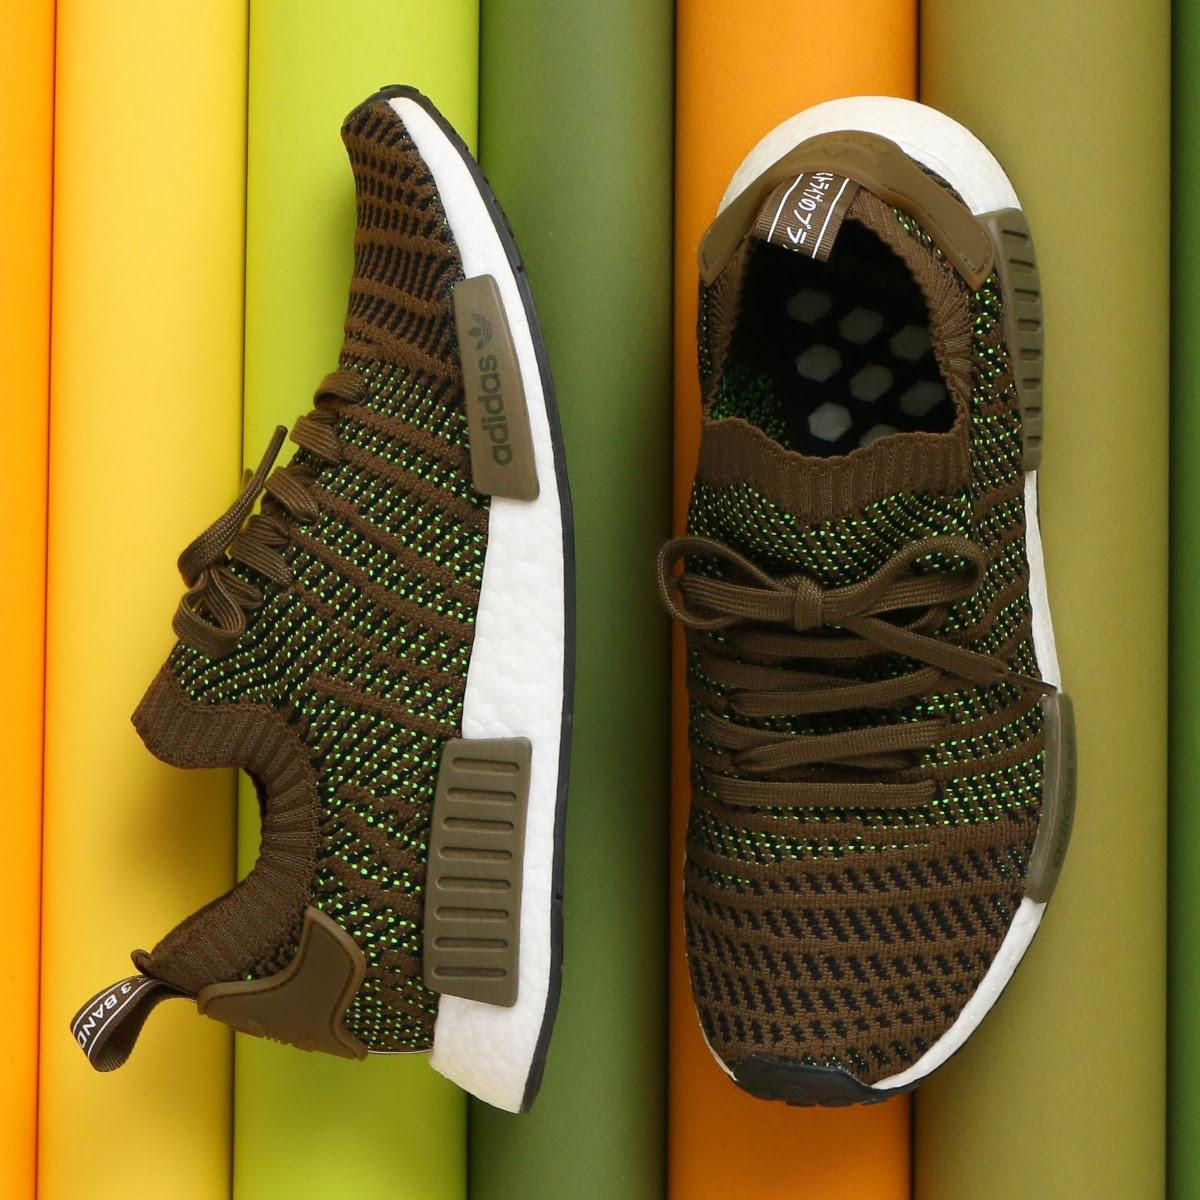 adidas Originals NMD_R1 STLT PK (アディダス オリジナルス エヌエムディー R1 STLT PK)Trace?Olive/Core Black/Solar Slime【メンズ スニーカー】18SS-S